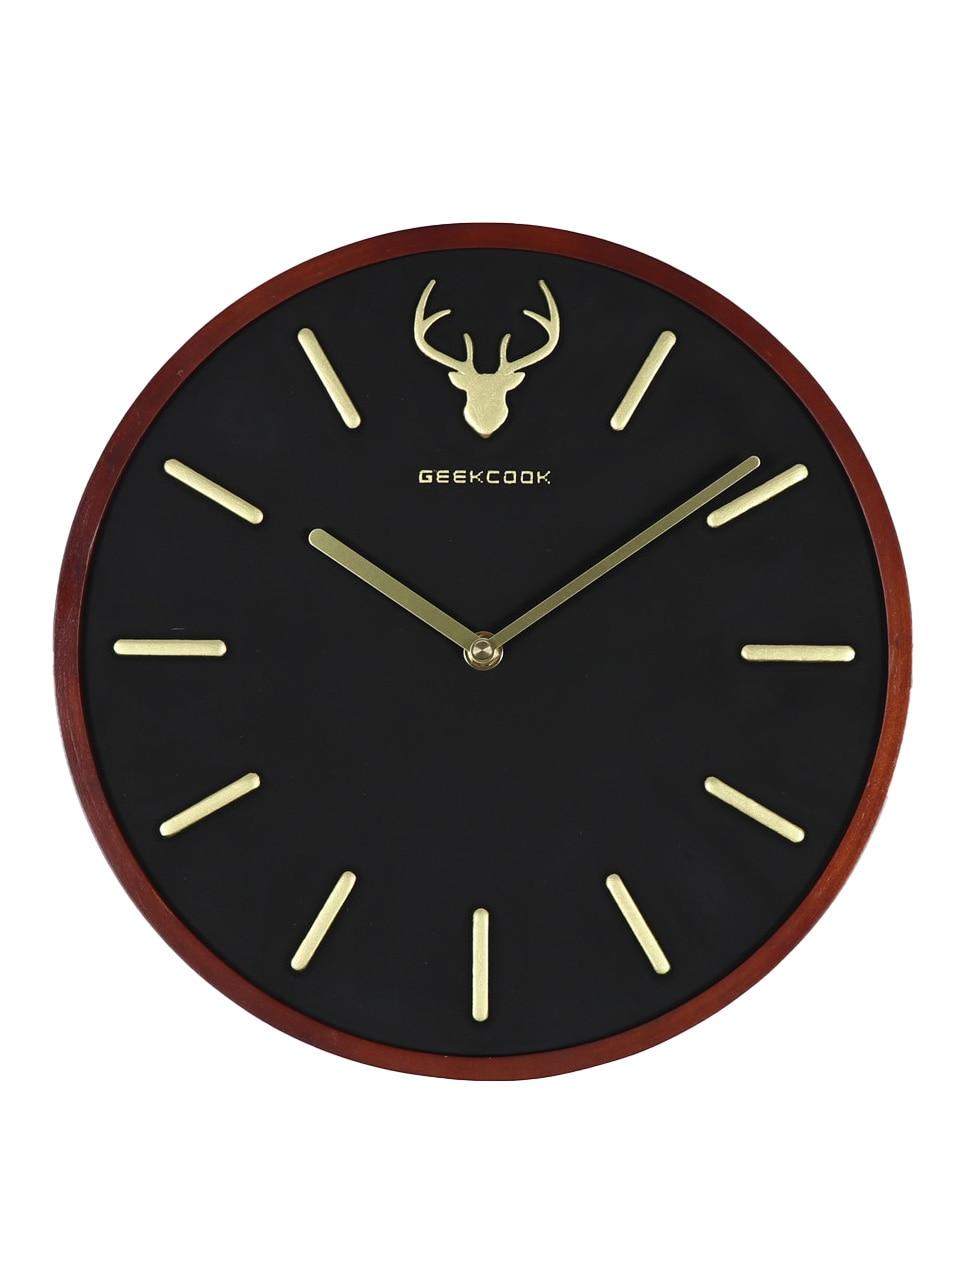 Luxury Stylish Wall Clock Wood Modern Design Minimalist Nordic Wall Clock Silent Reloj Pared Grande Stylish House Decor  SS60WC